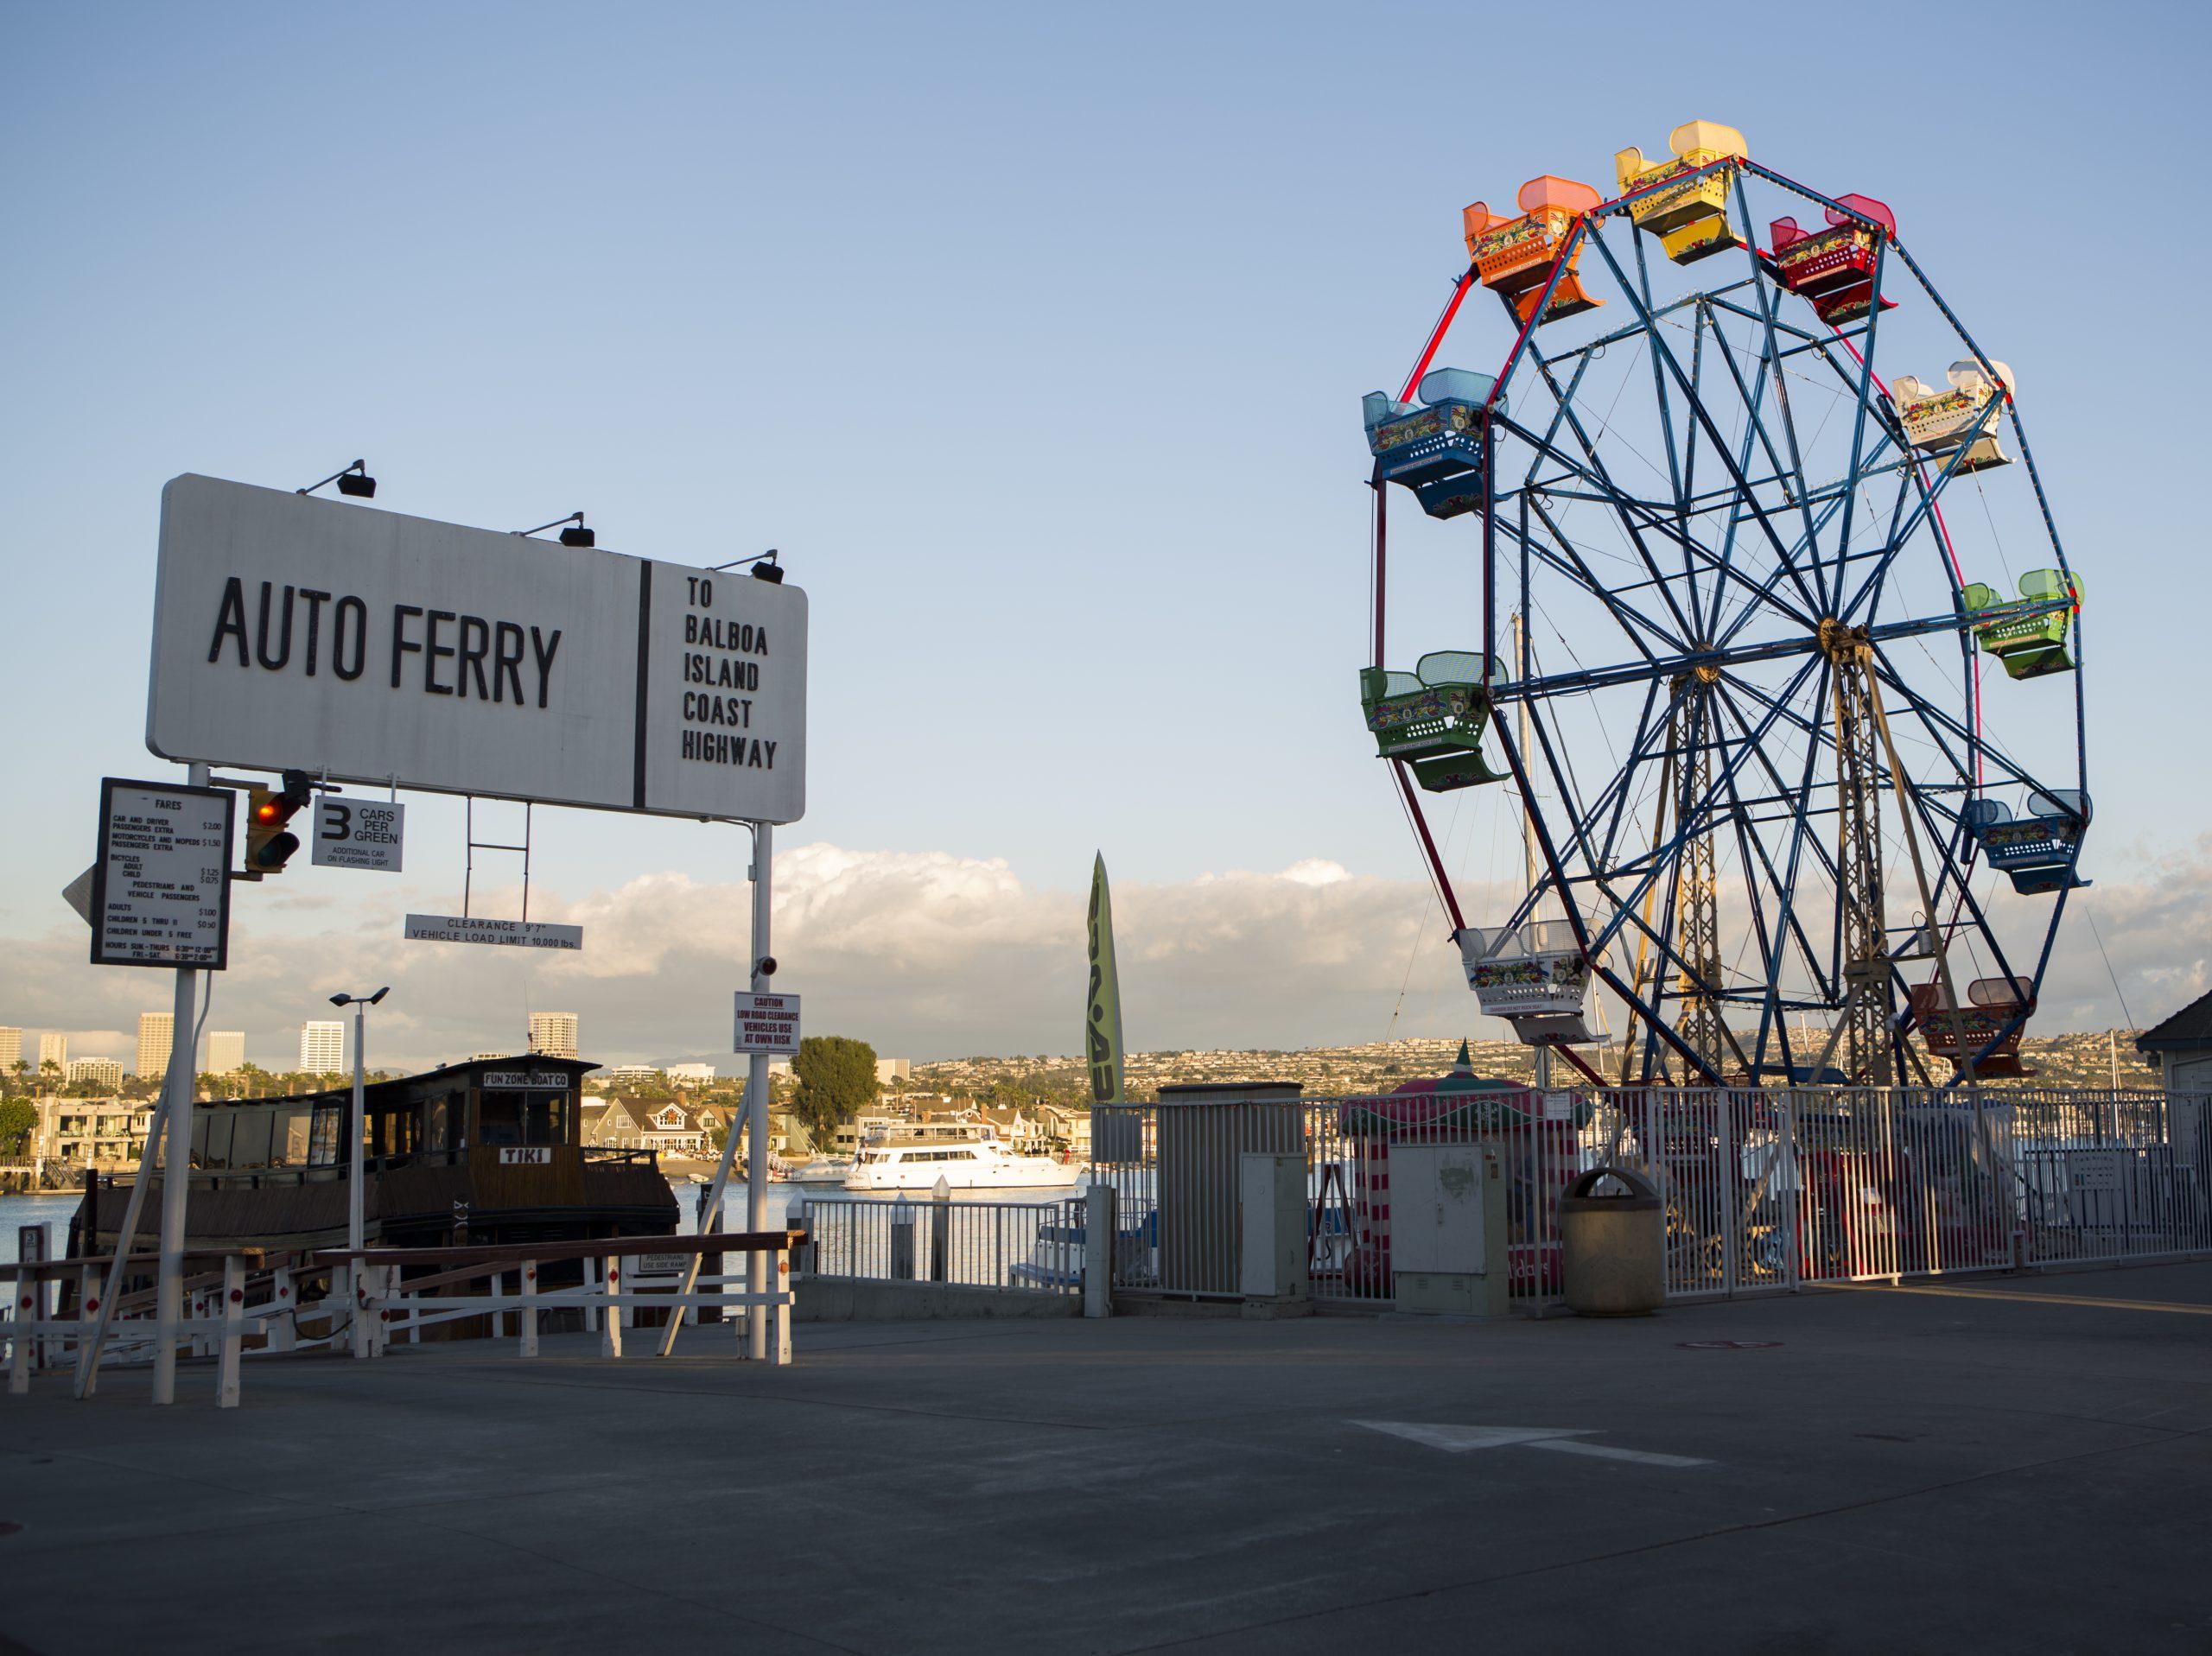 Balboa Fun Zone - Is it Open, What to Do